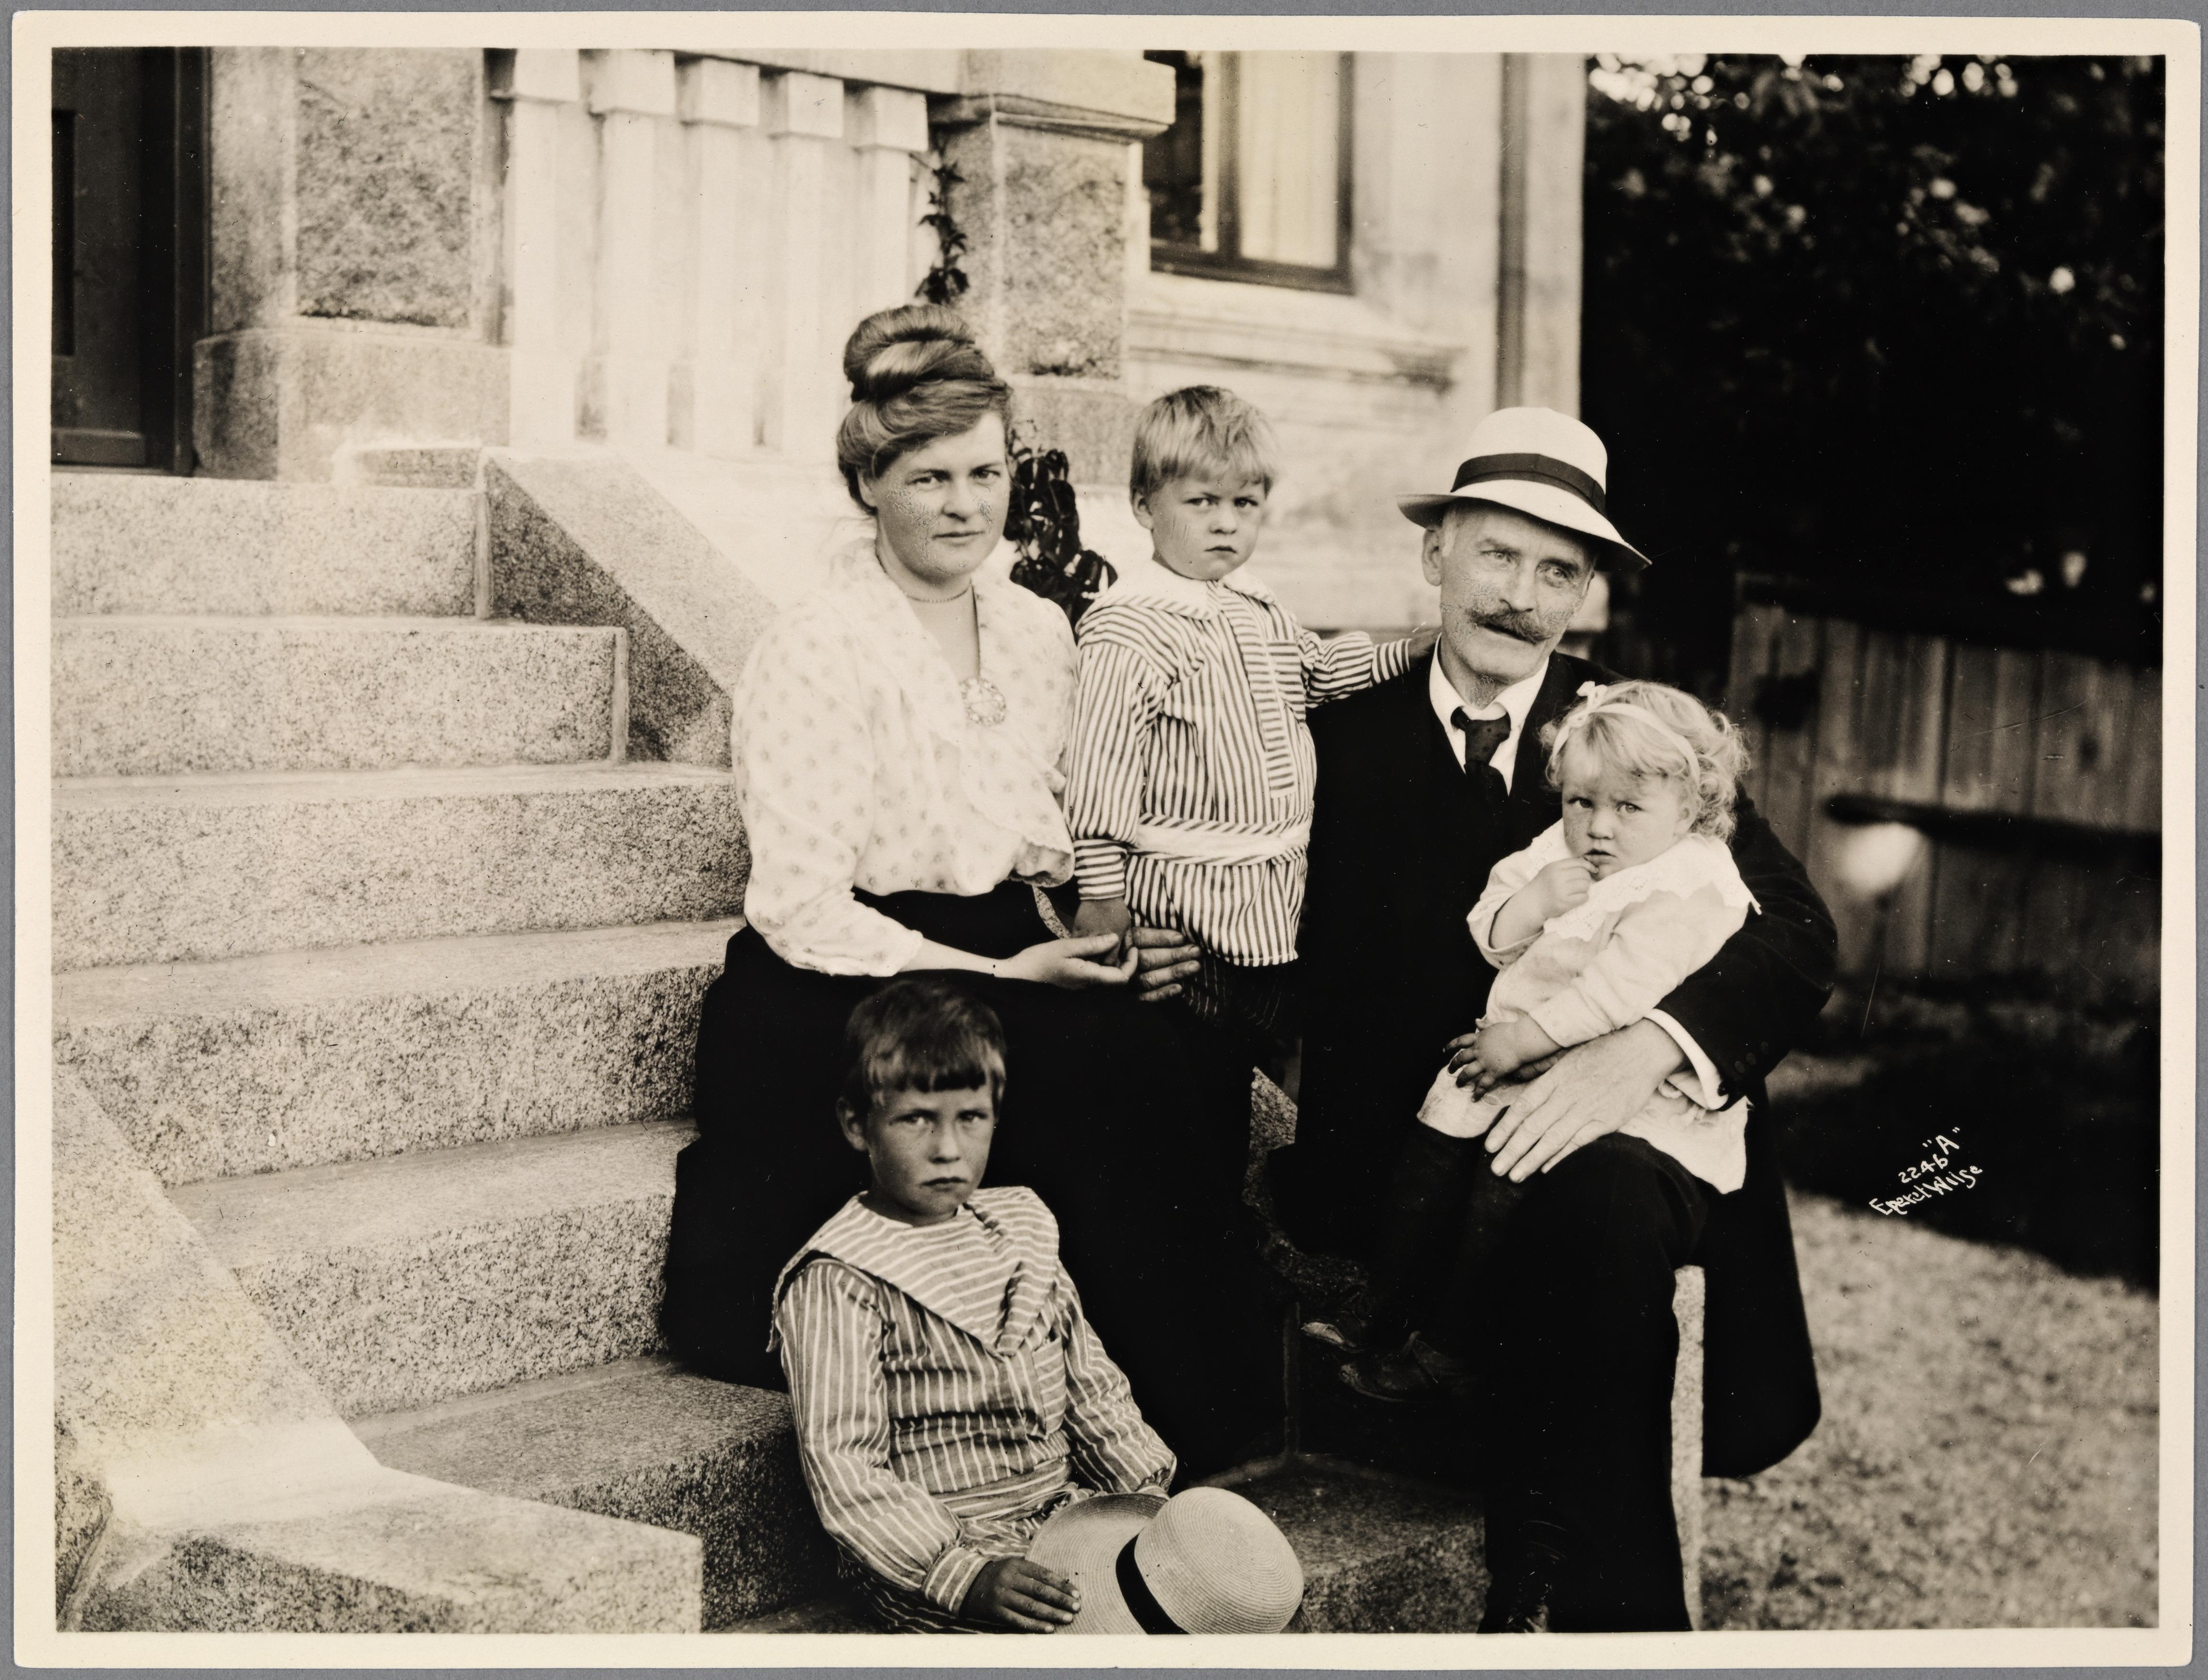 Portrett av Knut Hamsun med familie, Larvik, 1917